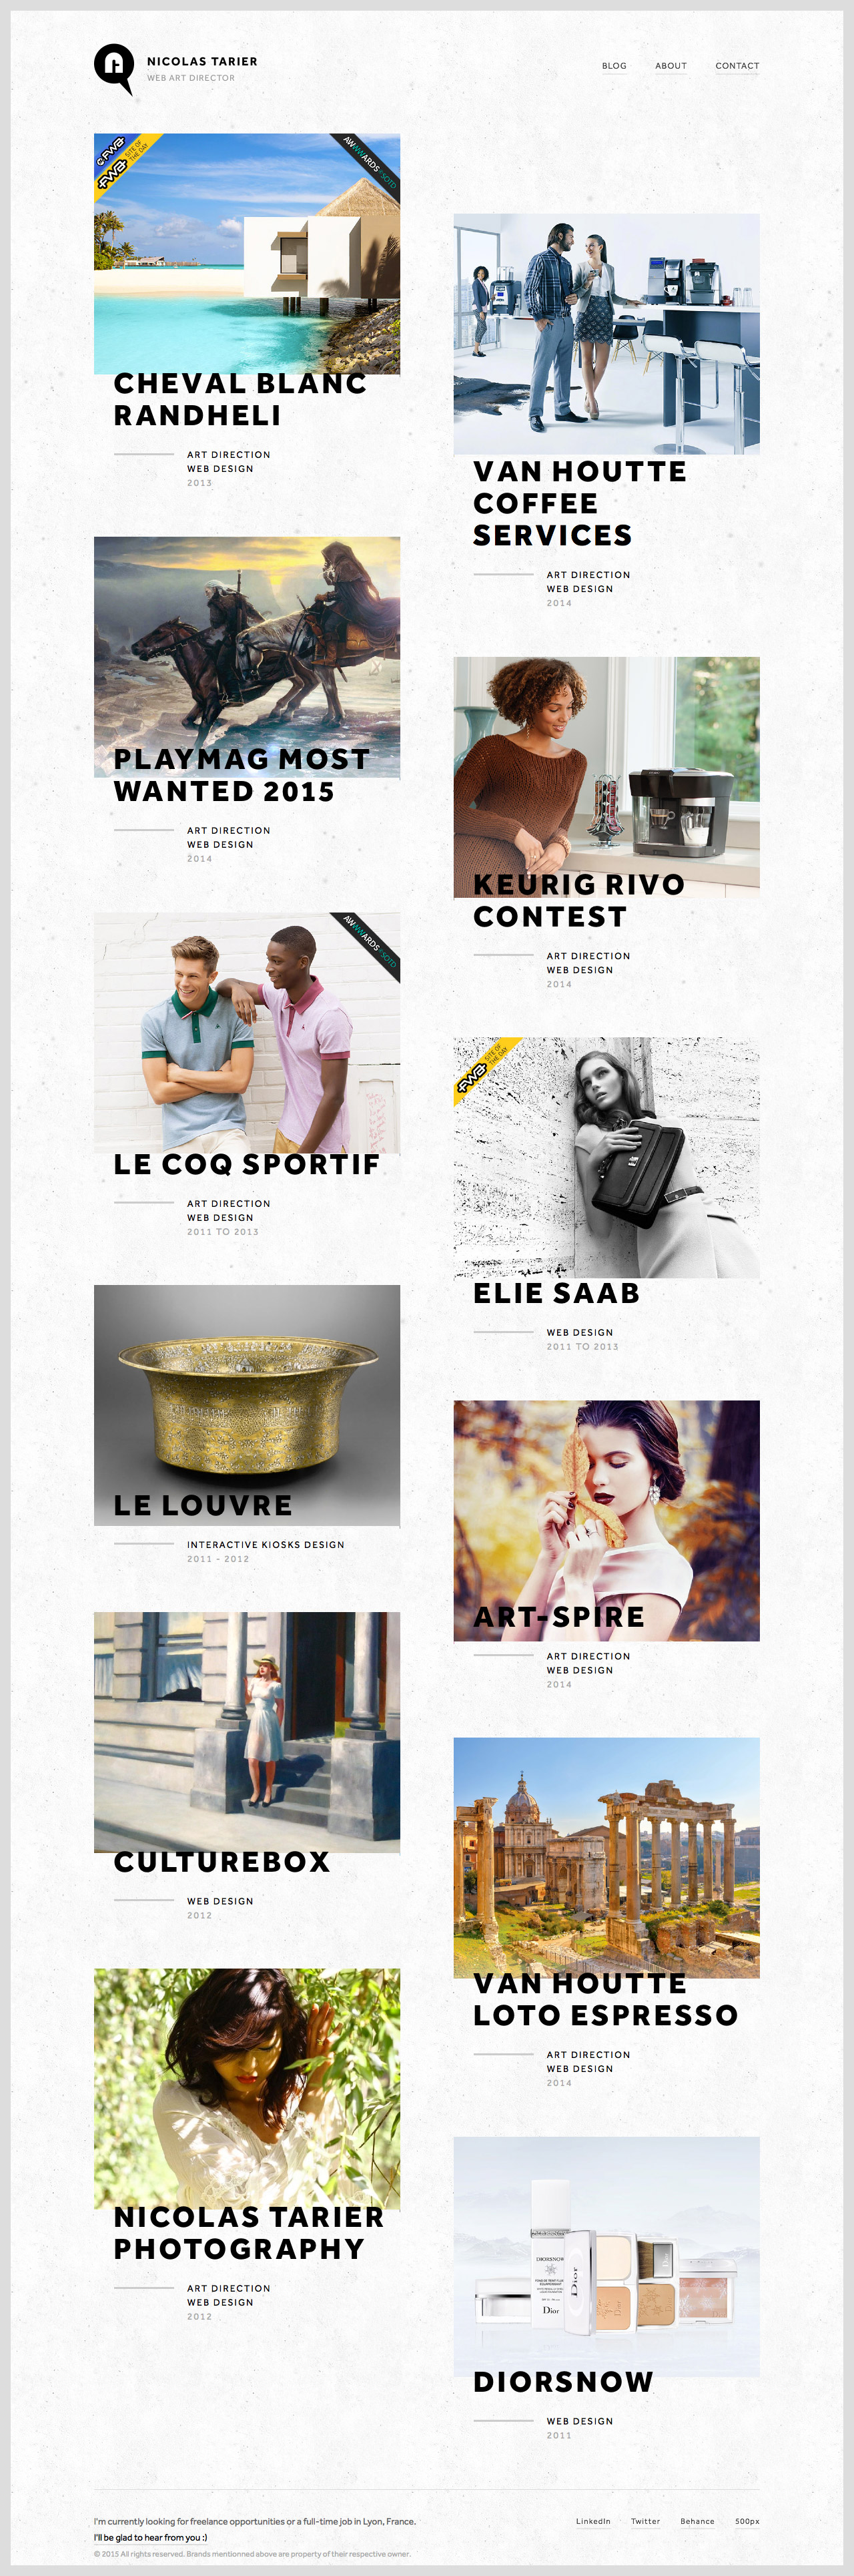 Nicolas Tarier Website Screenshot